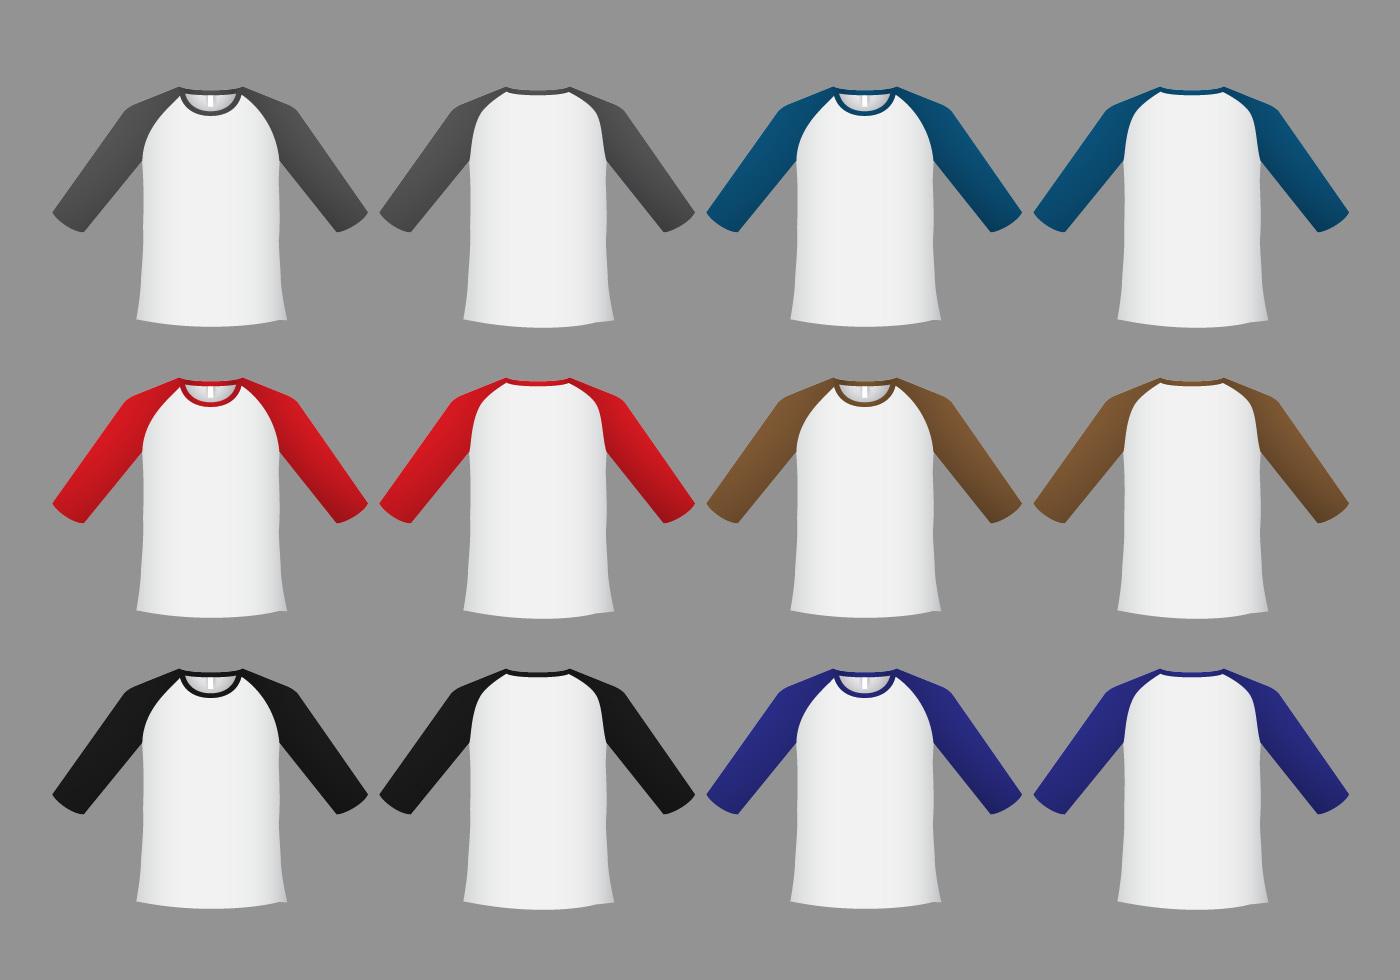 Raglan T-shirt Template Vector - Download Free Vector Art, Stock ...